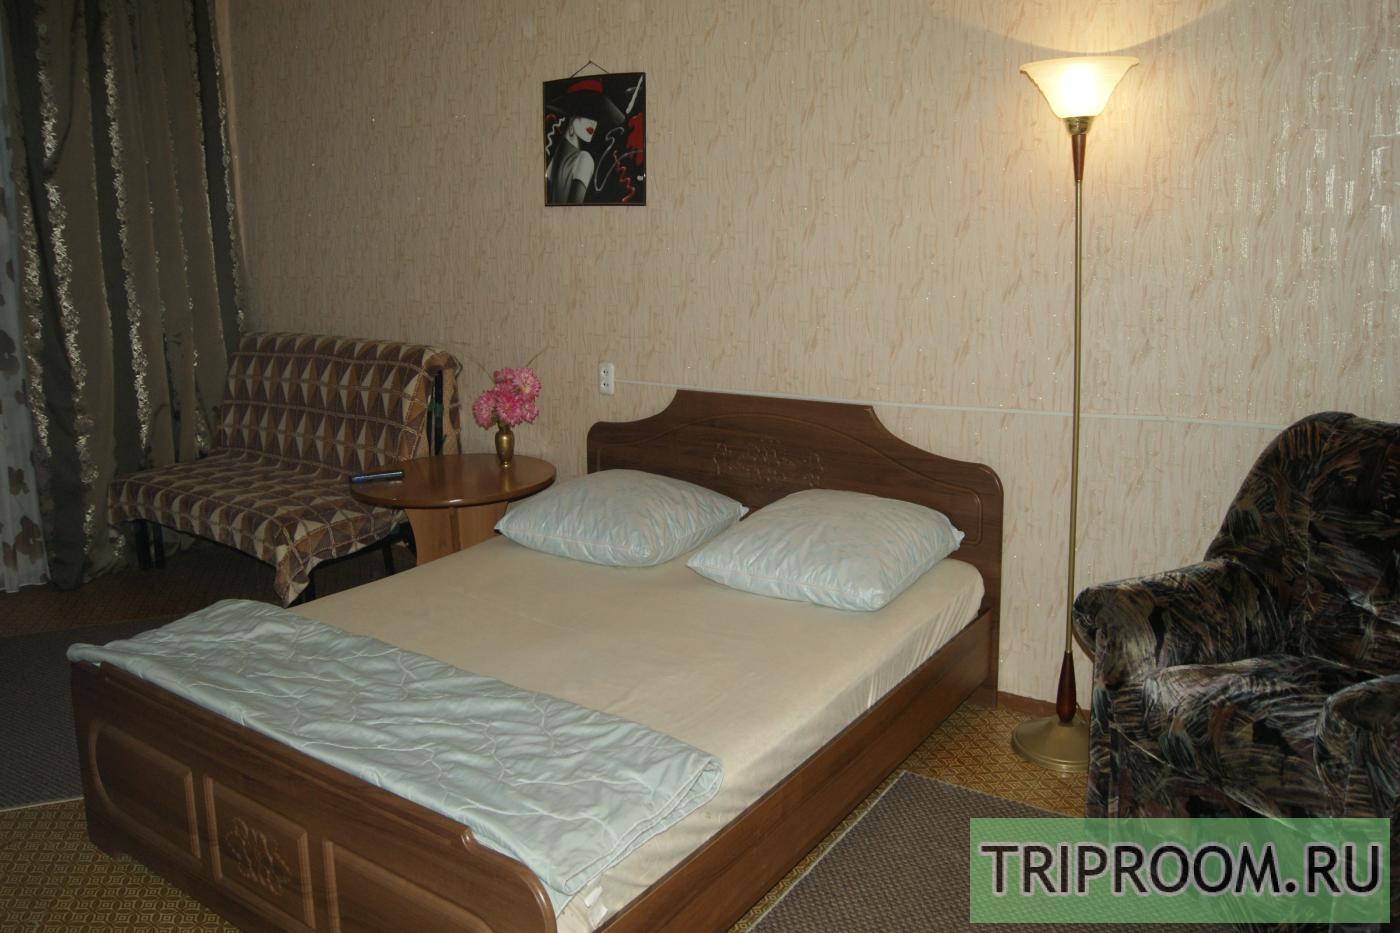 1-комнатная квартира посуточно (вариант № 7762), ул. Штеменко улица, фото № 2